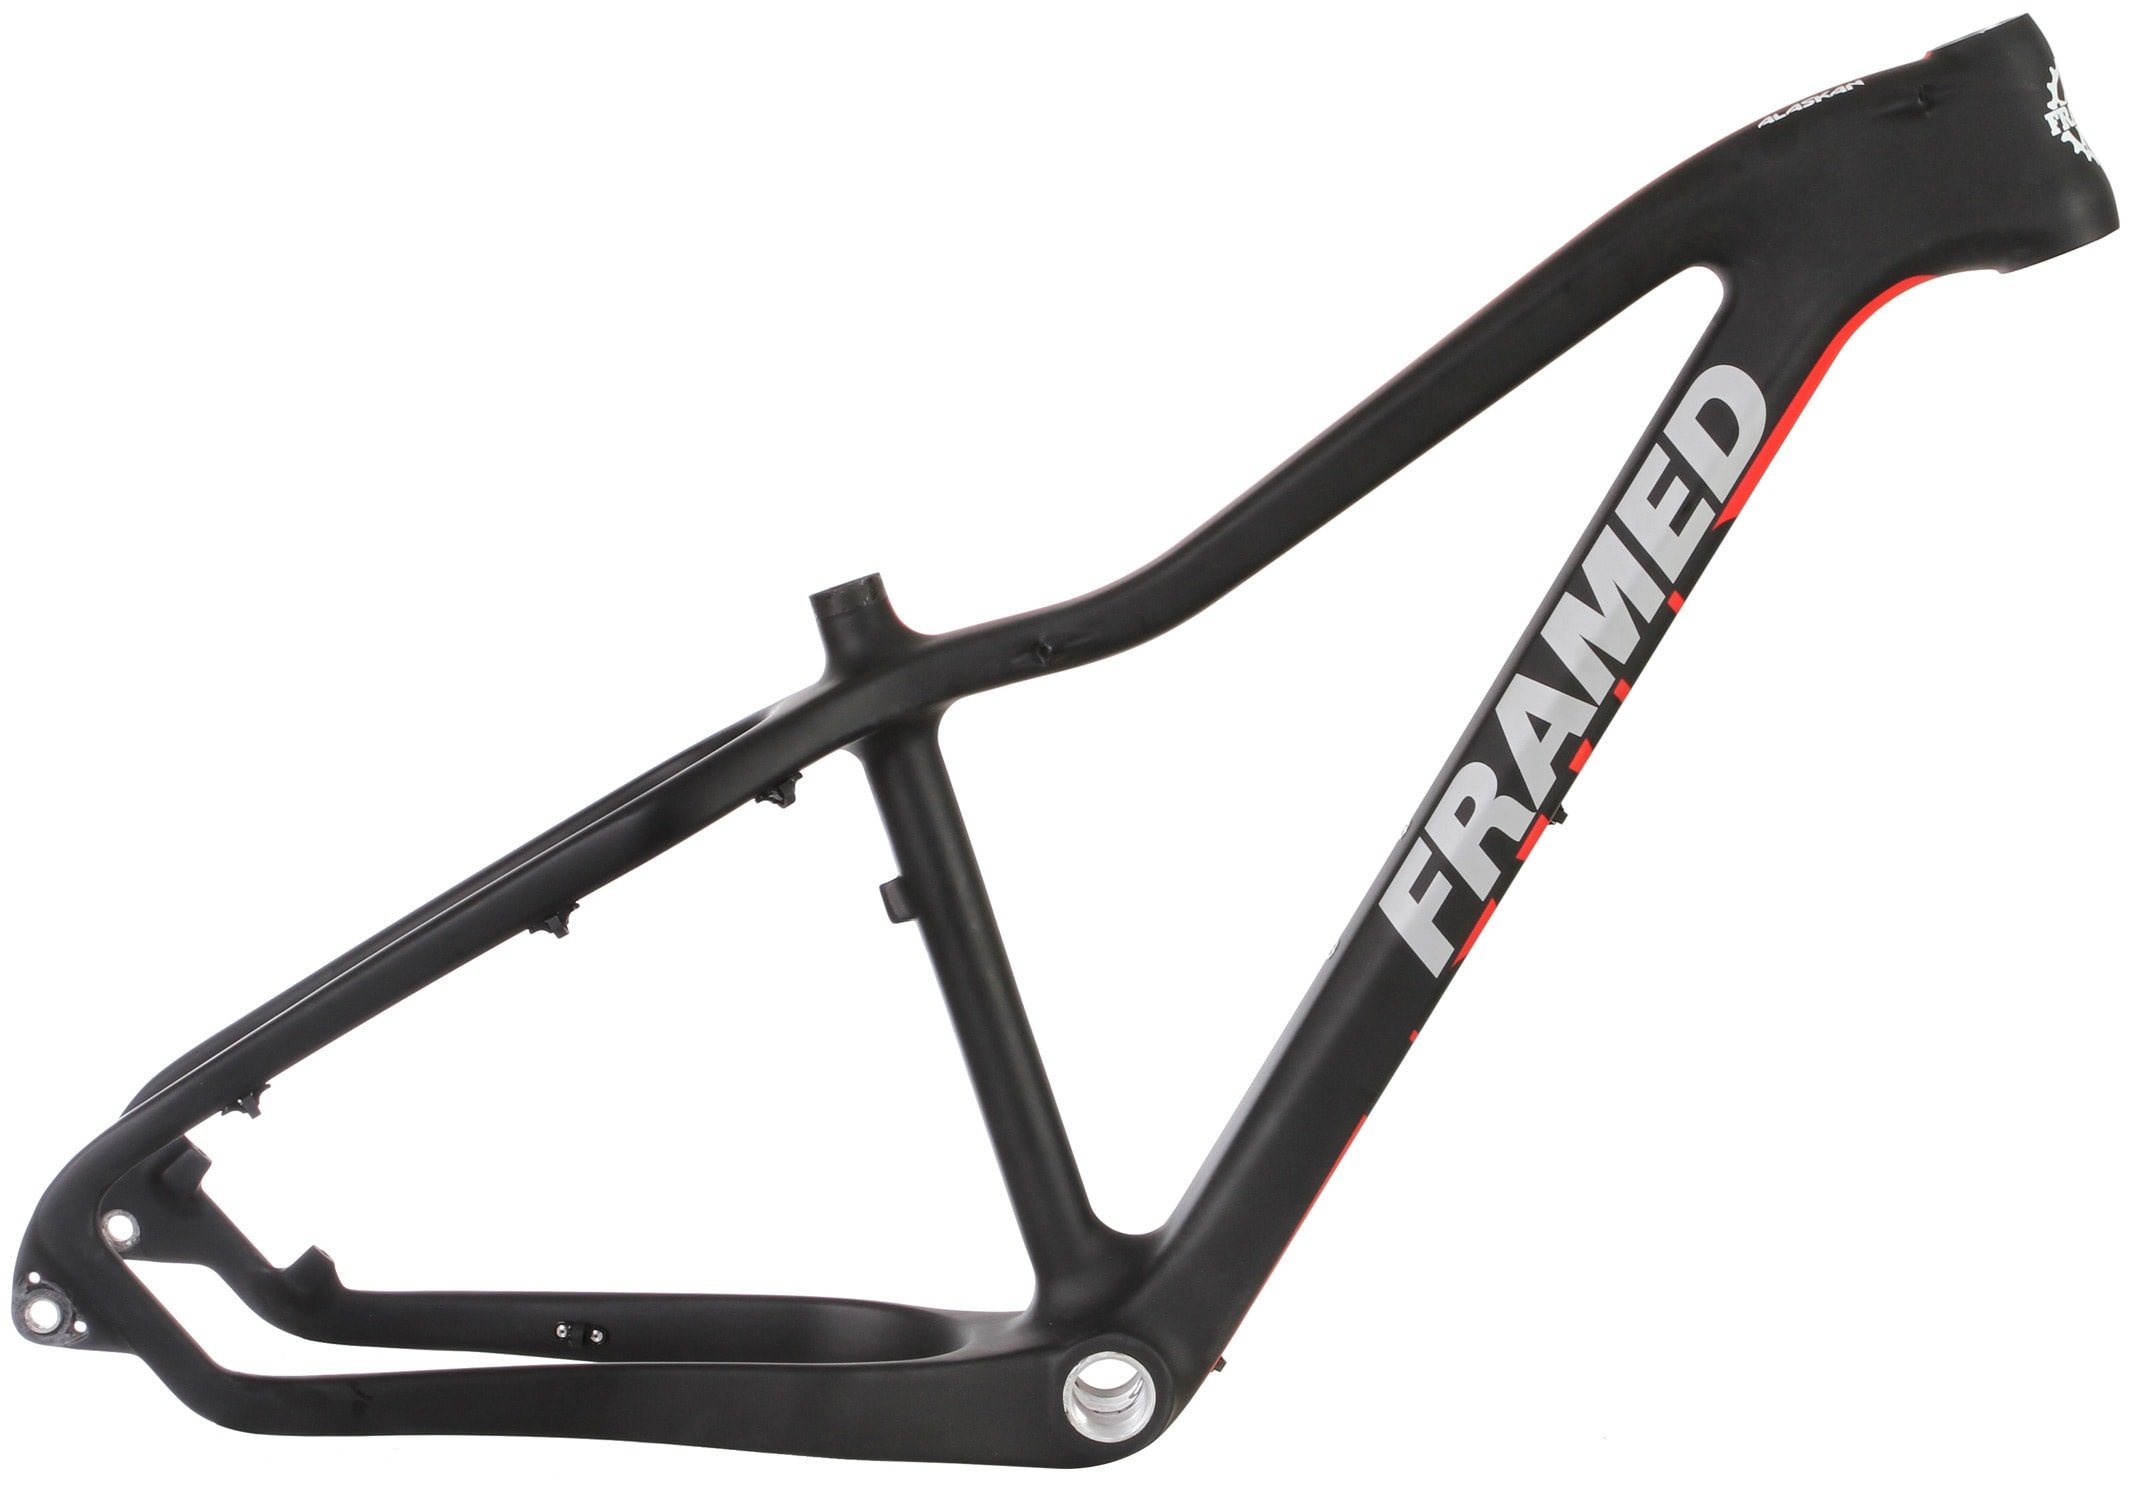 Alaskan Carbon Fat Bike Frame